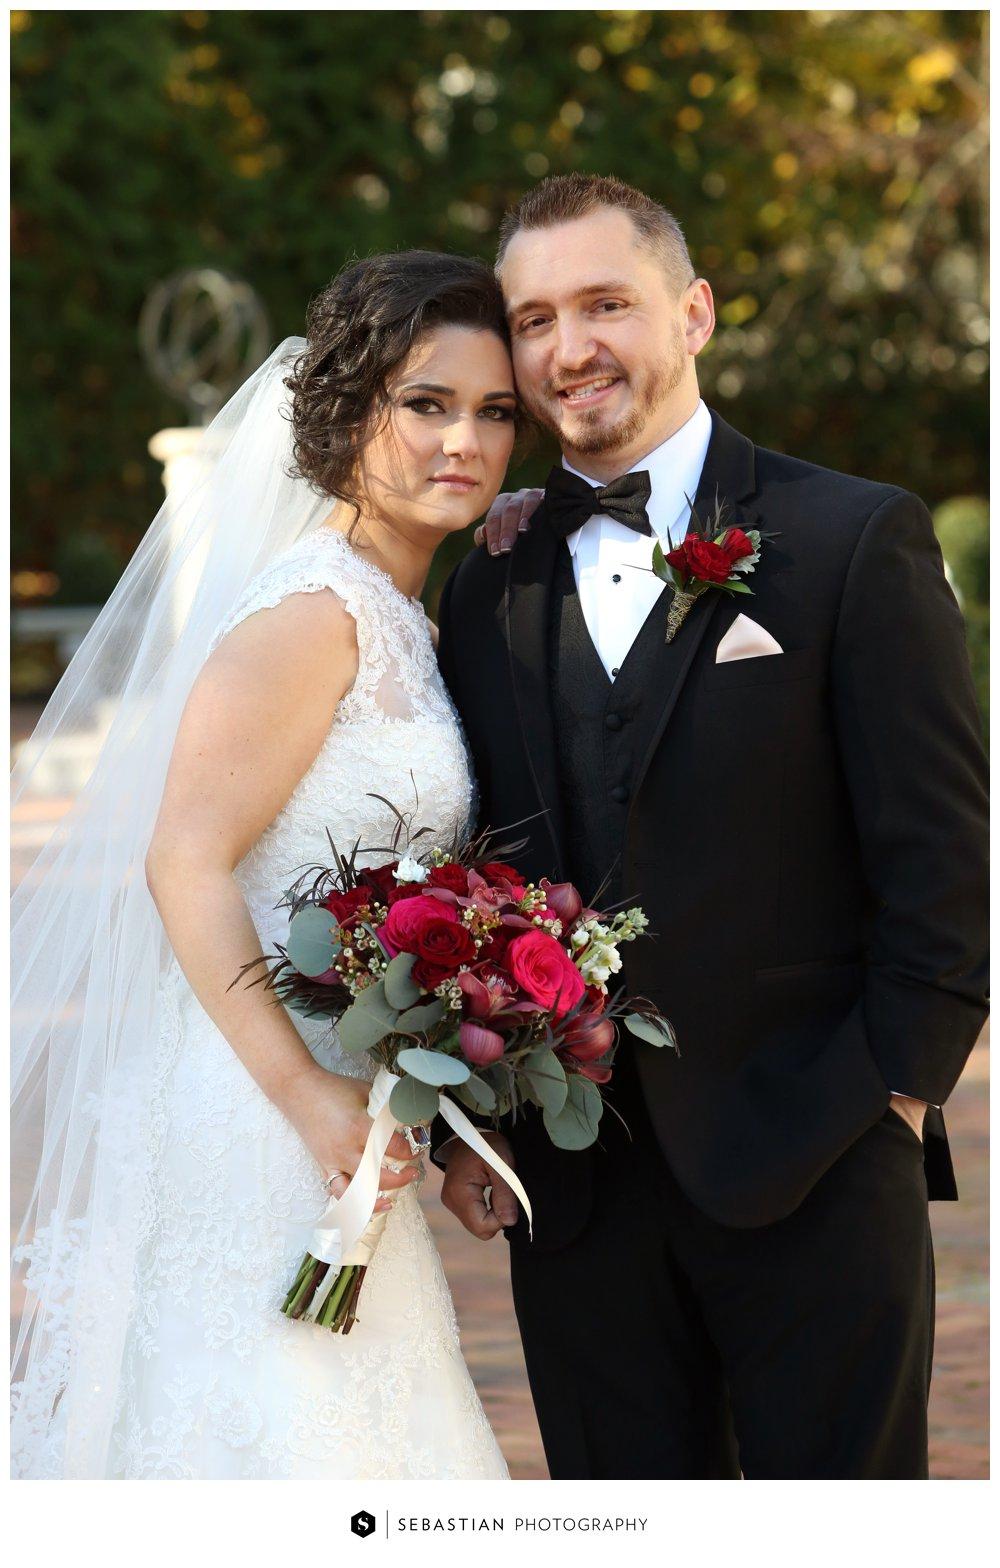 Sebastian Photography_NJ Wedding_NJWedding Photographer_Fall Wedding_The Estate at Florentine Gardens_7032.jpg